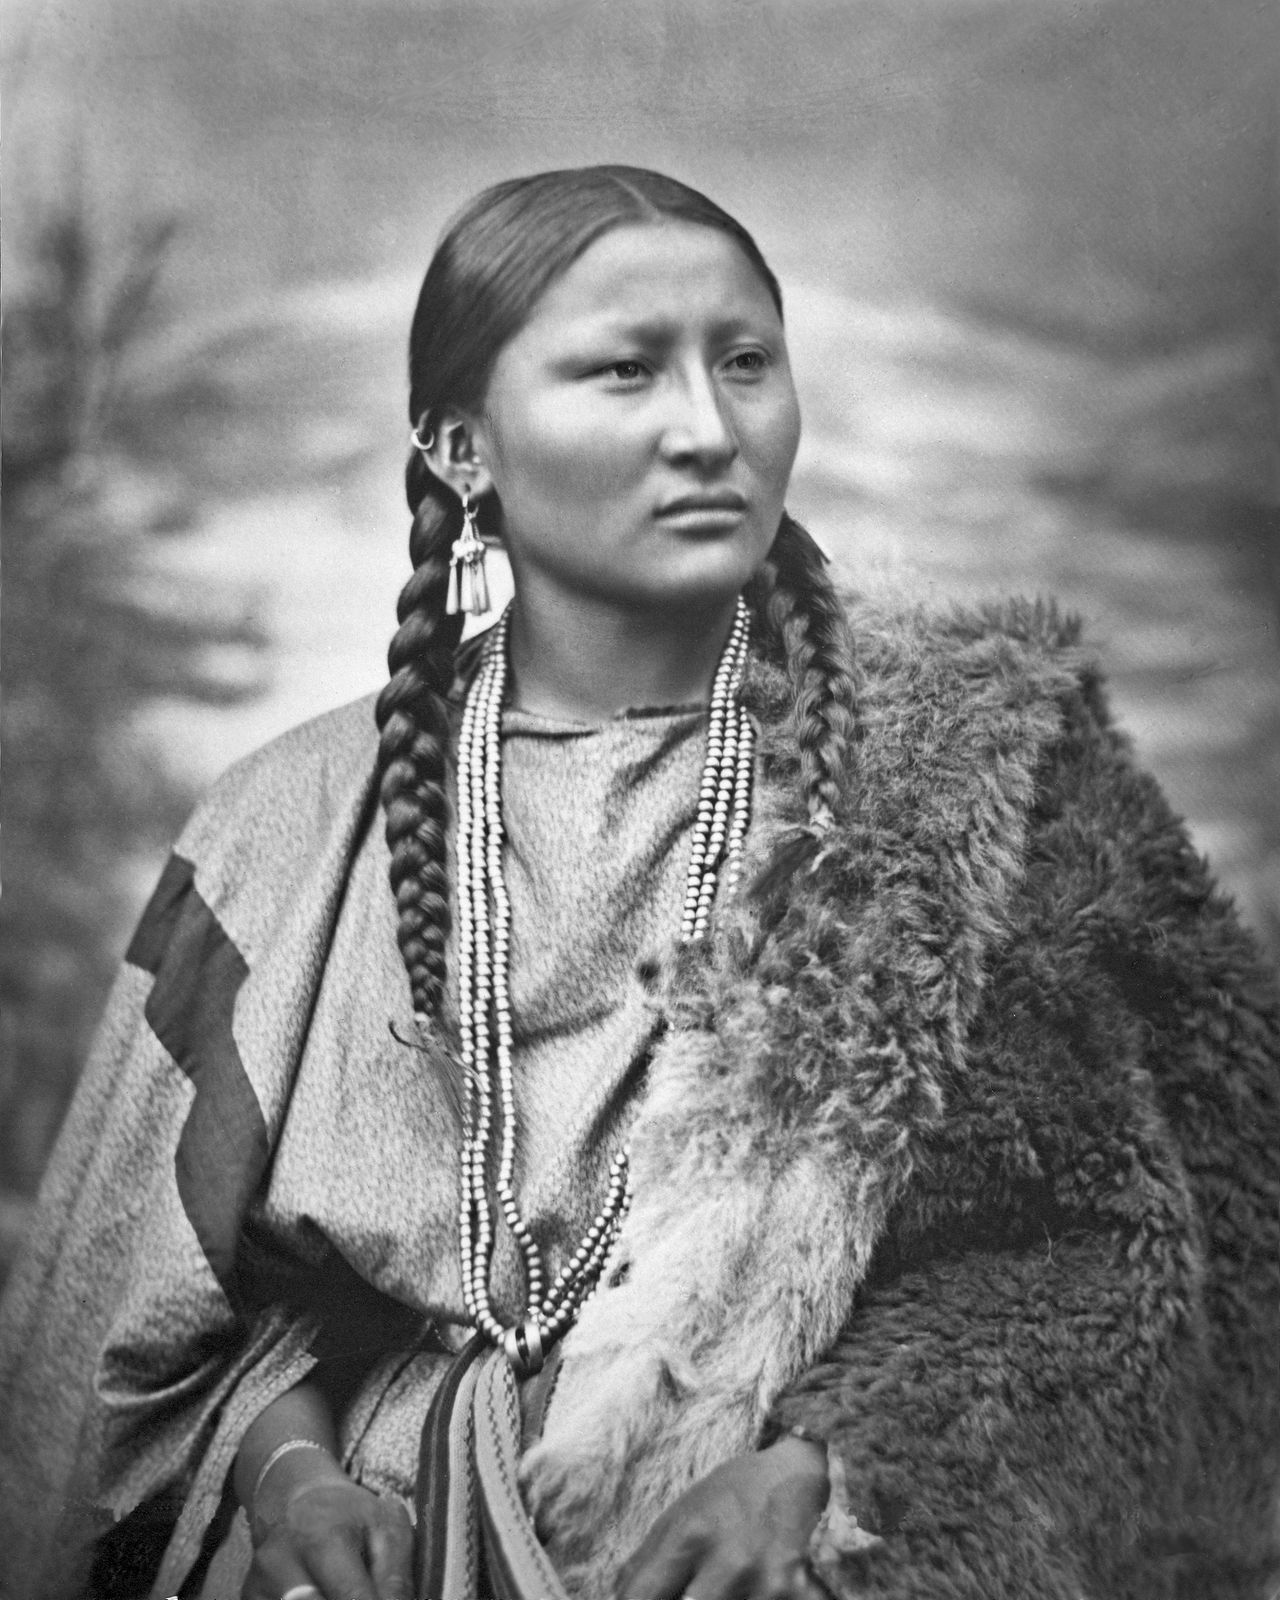 Cheyenne Woman Pretty Nose Restored